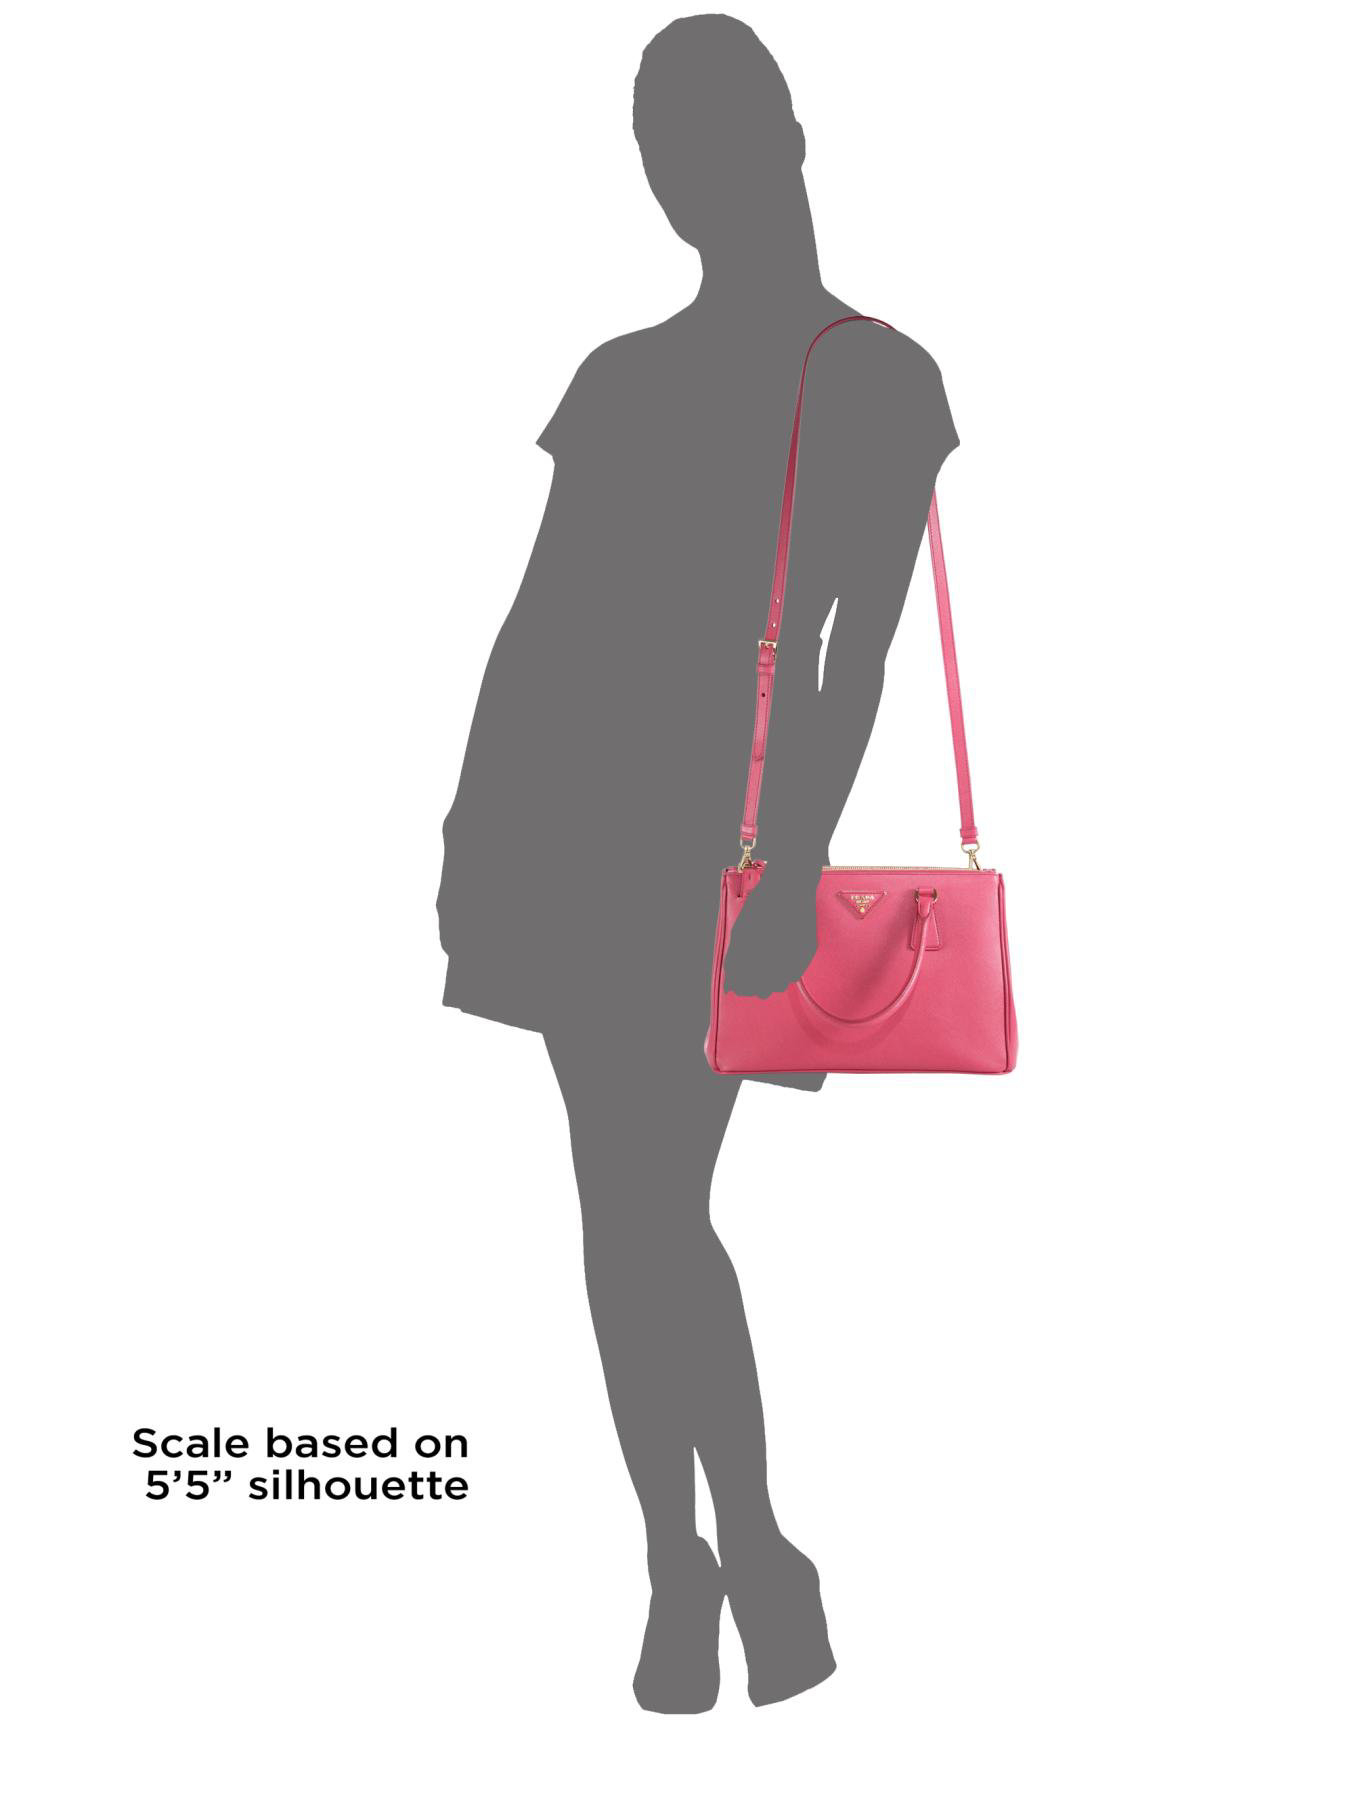 prada woman bag - saffiano lux tote bag small, prada vela tote